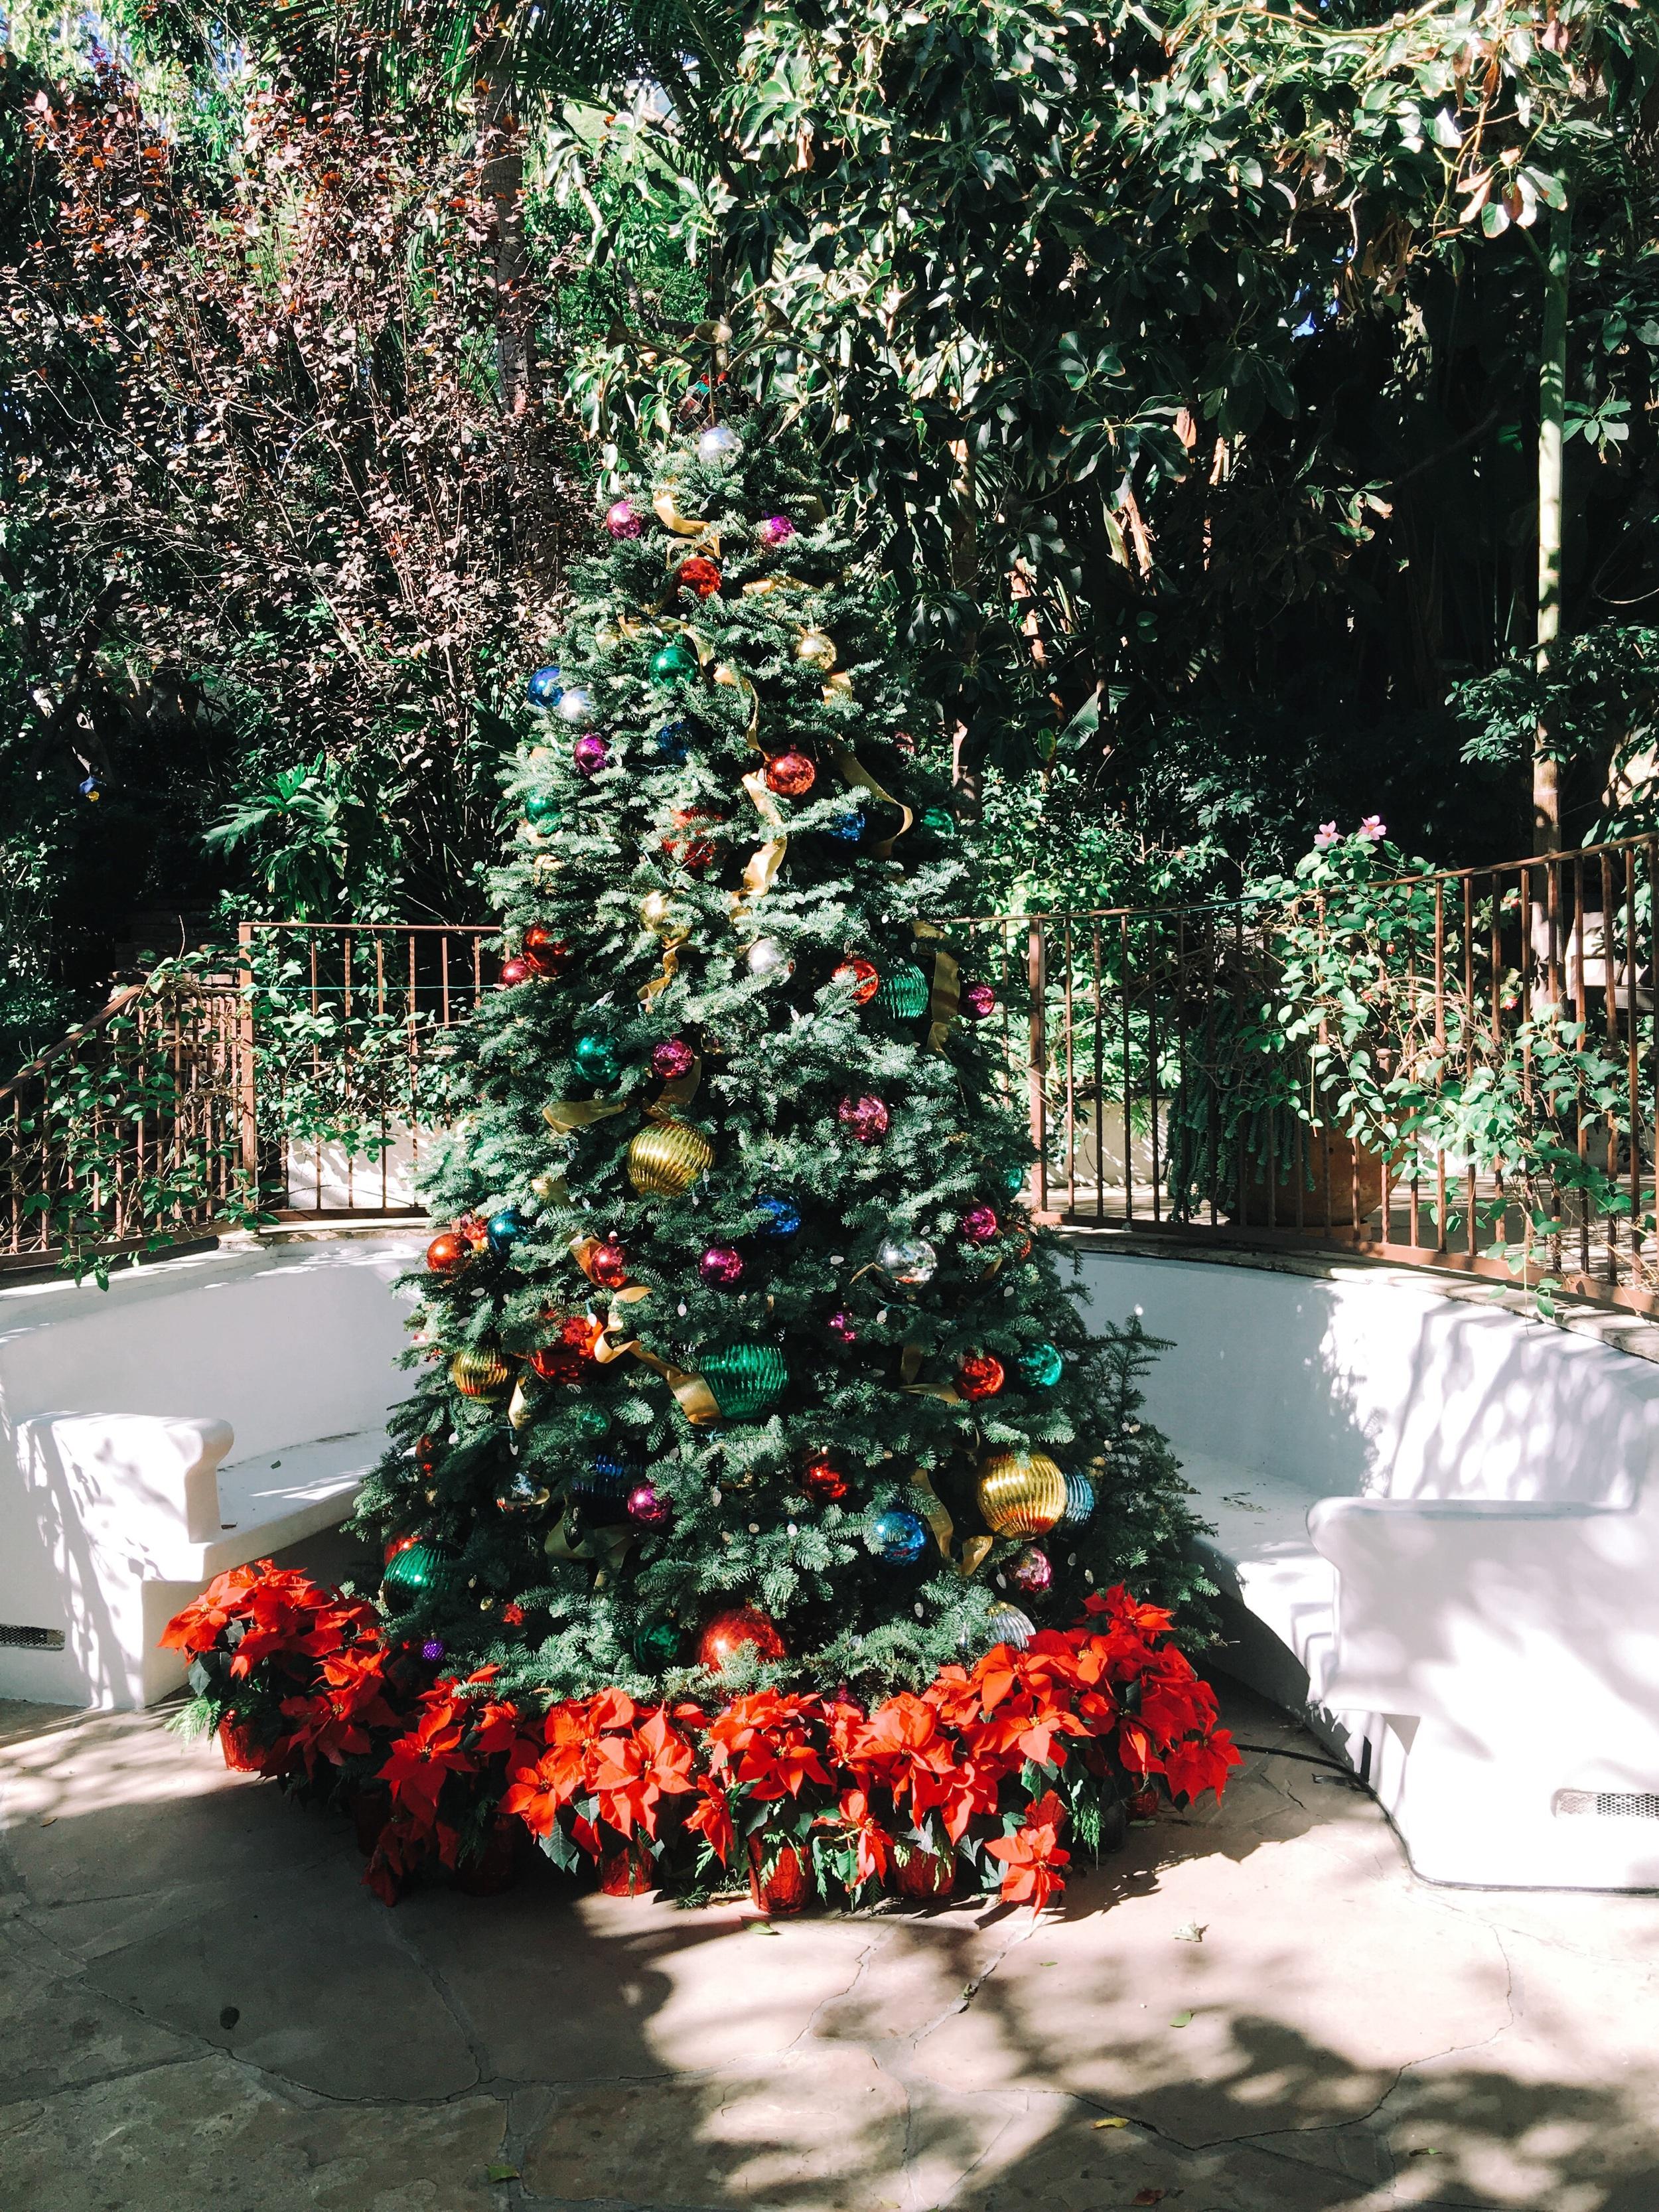 A Gratuitous Pagan Christmas Tree at the hotel